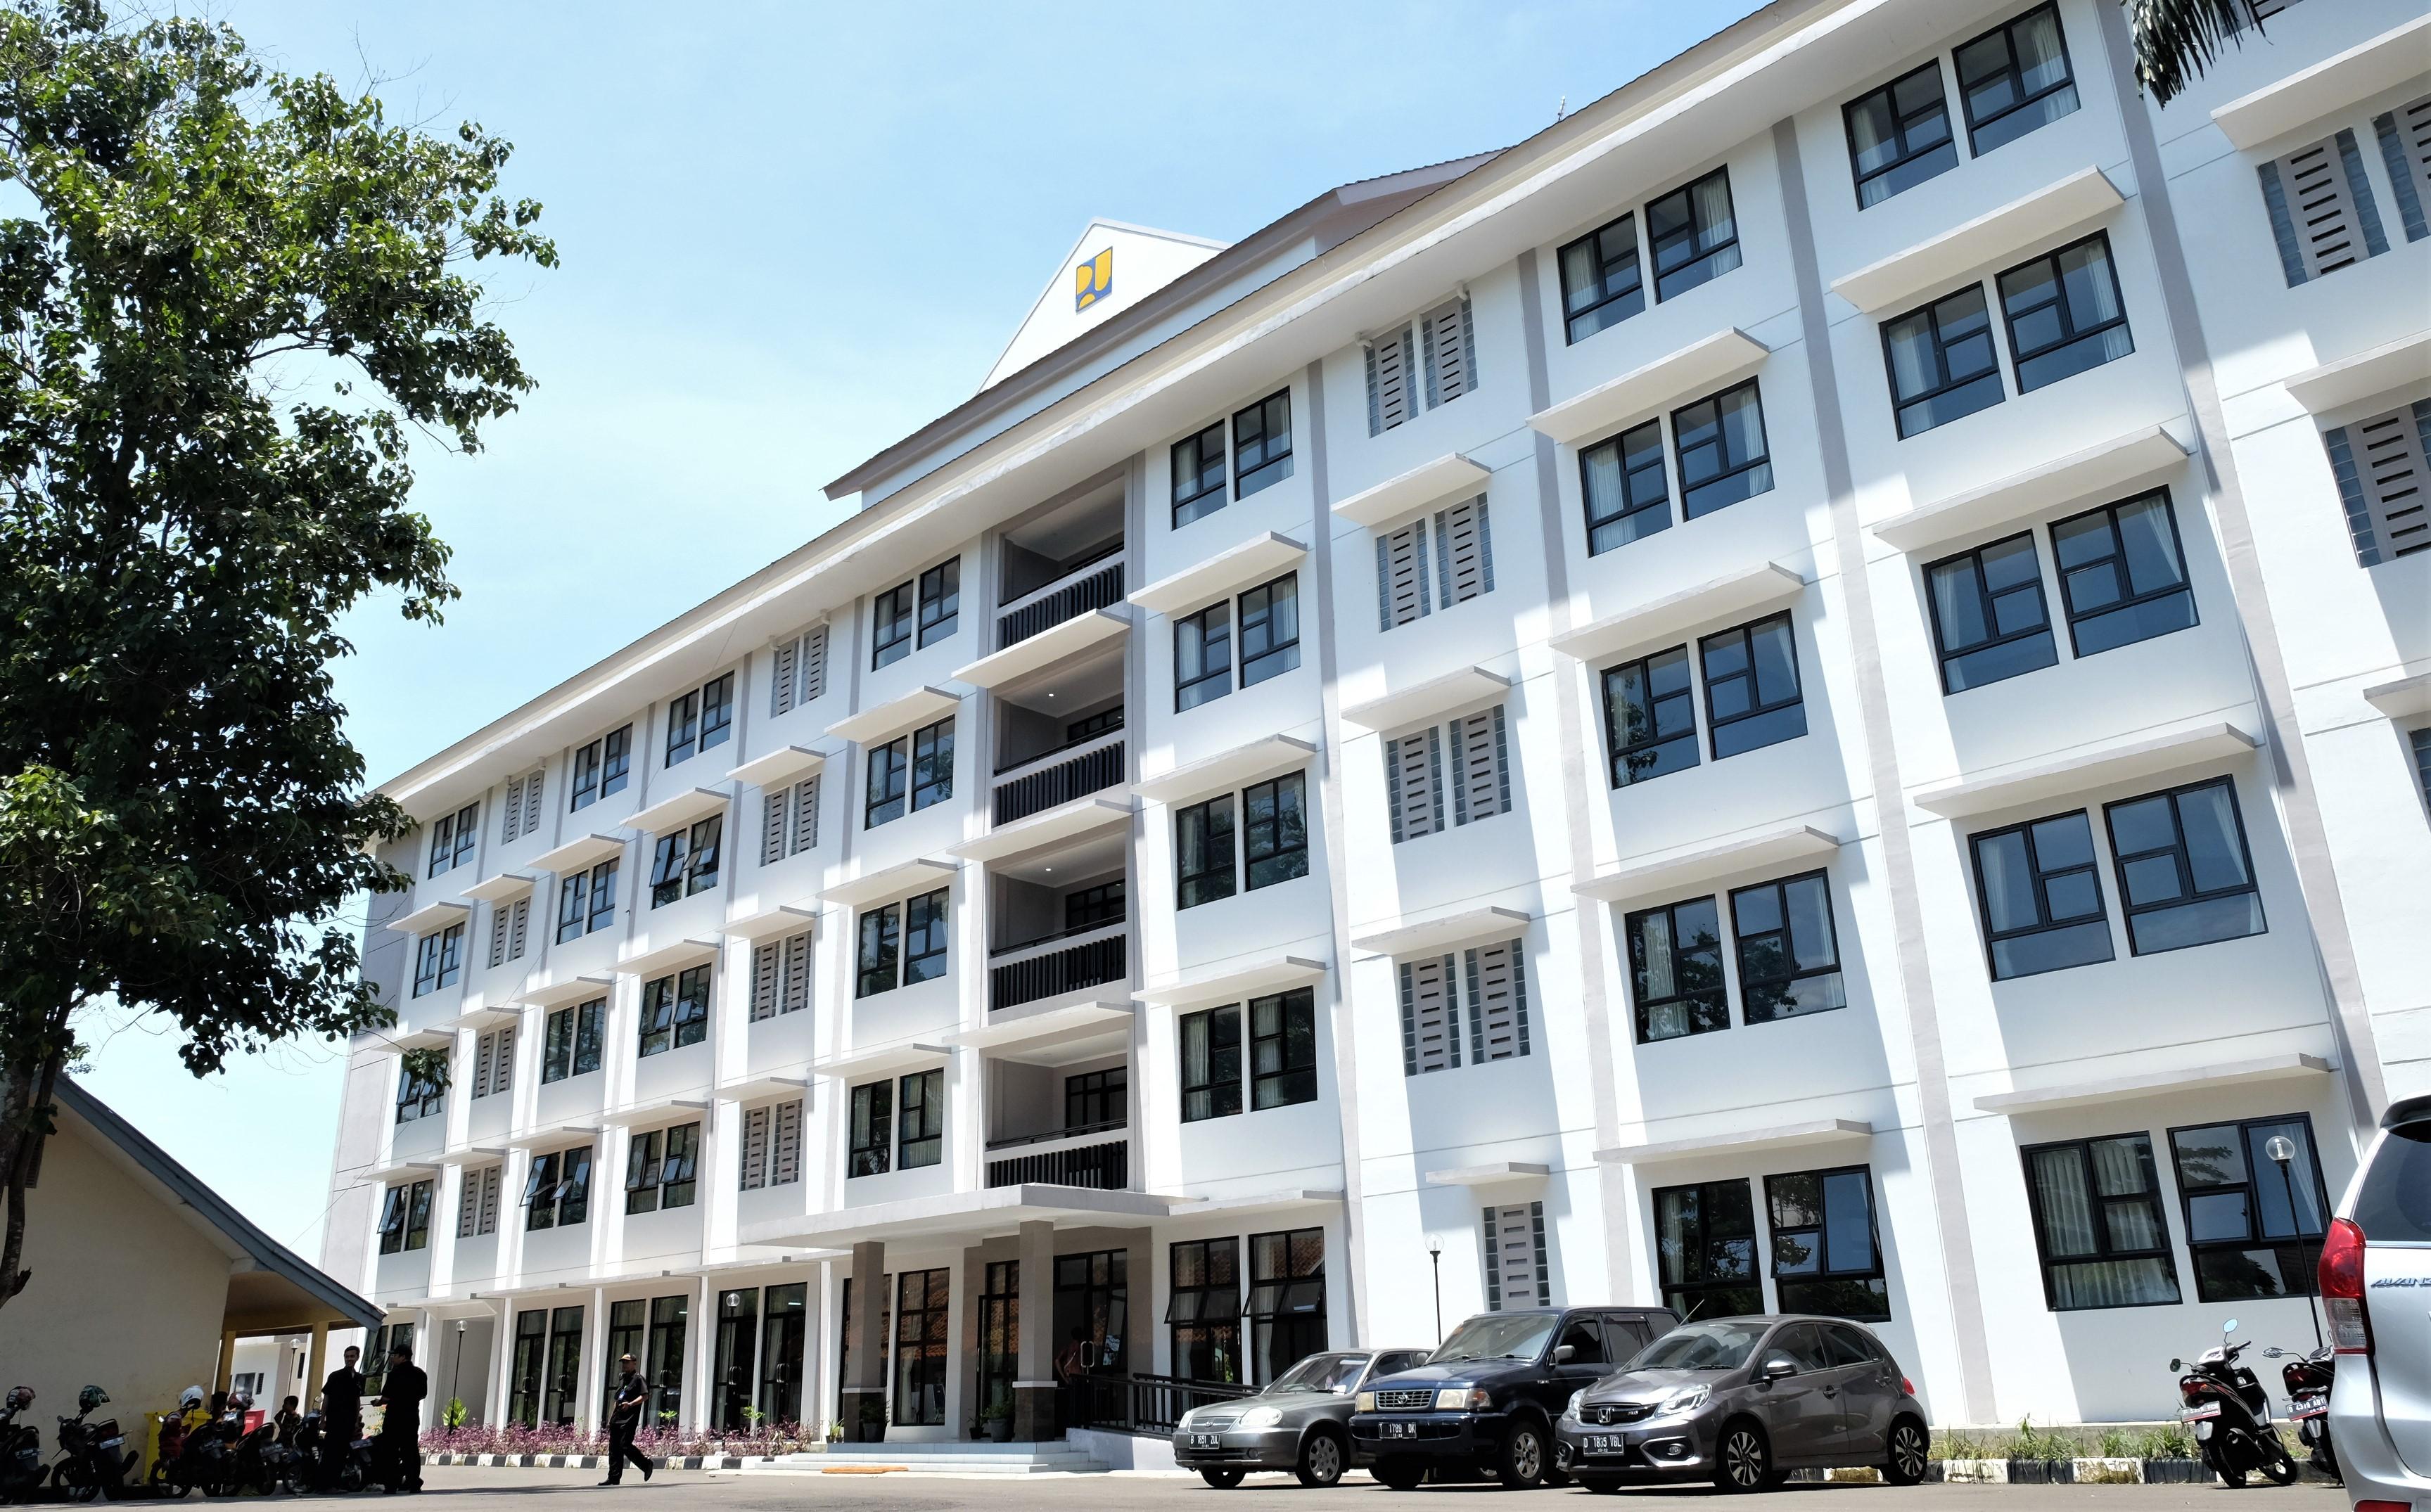 Wujudkan Living Learning Community, ITB Bangun Rusun Dosen di Kampus  Jatinangor - Institut Teknologi Bandung